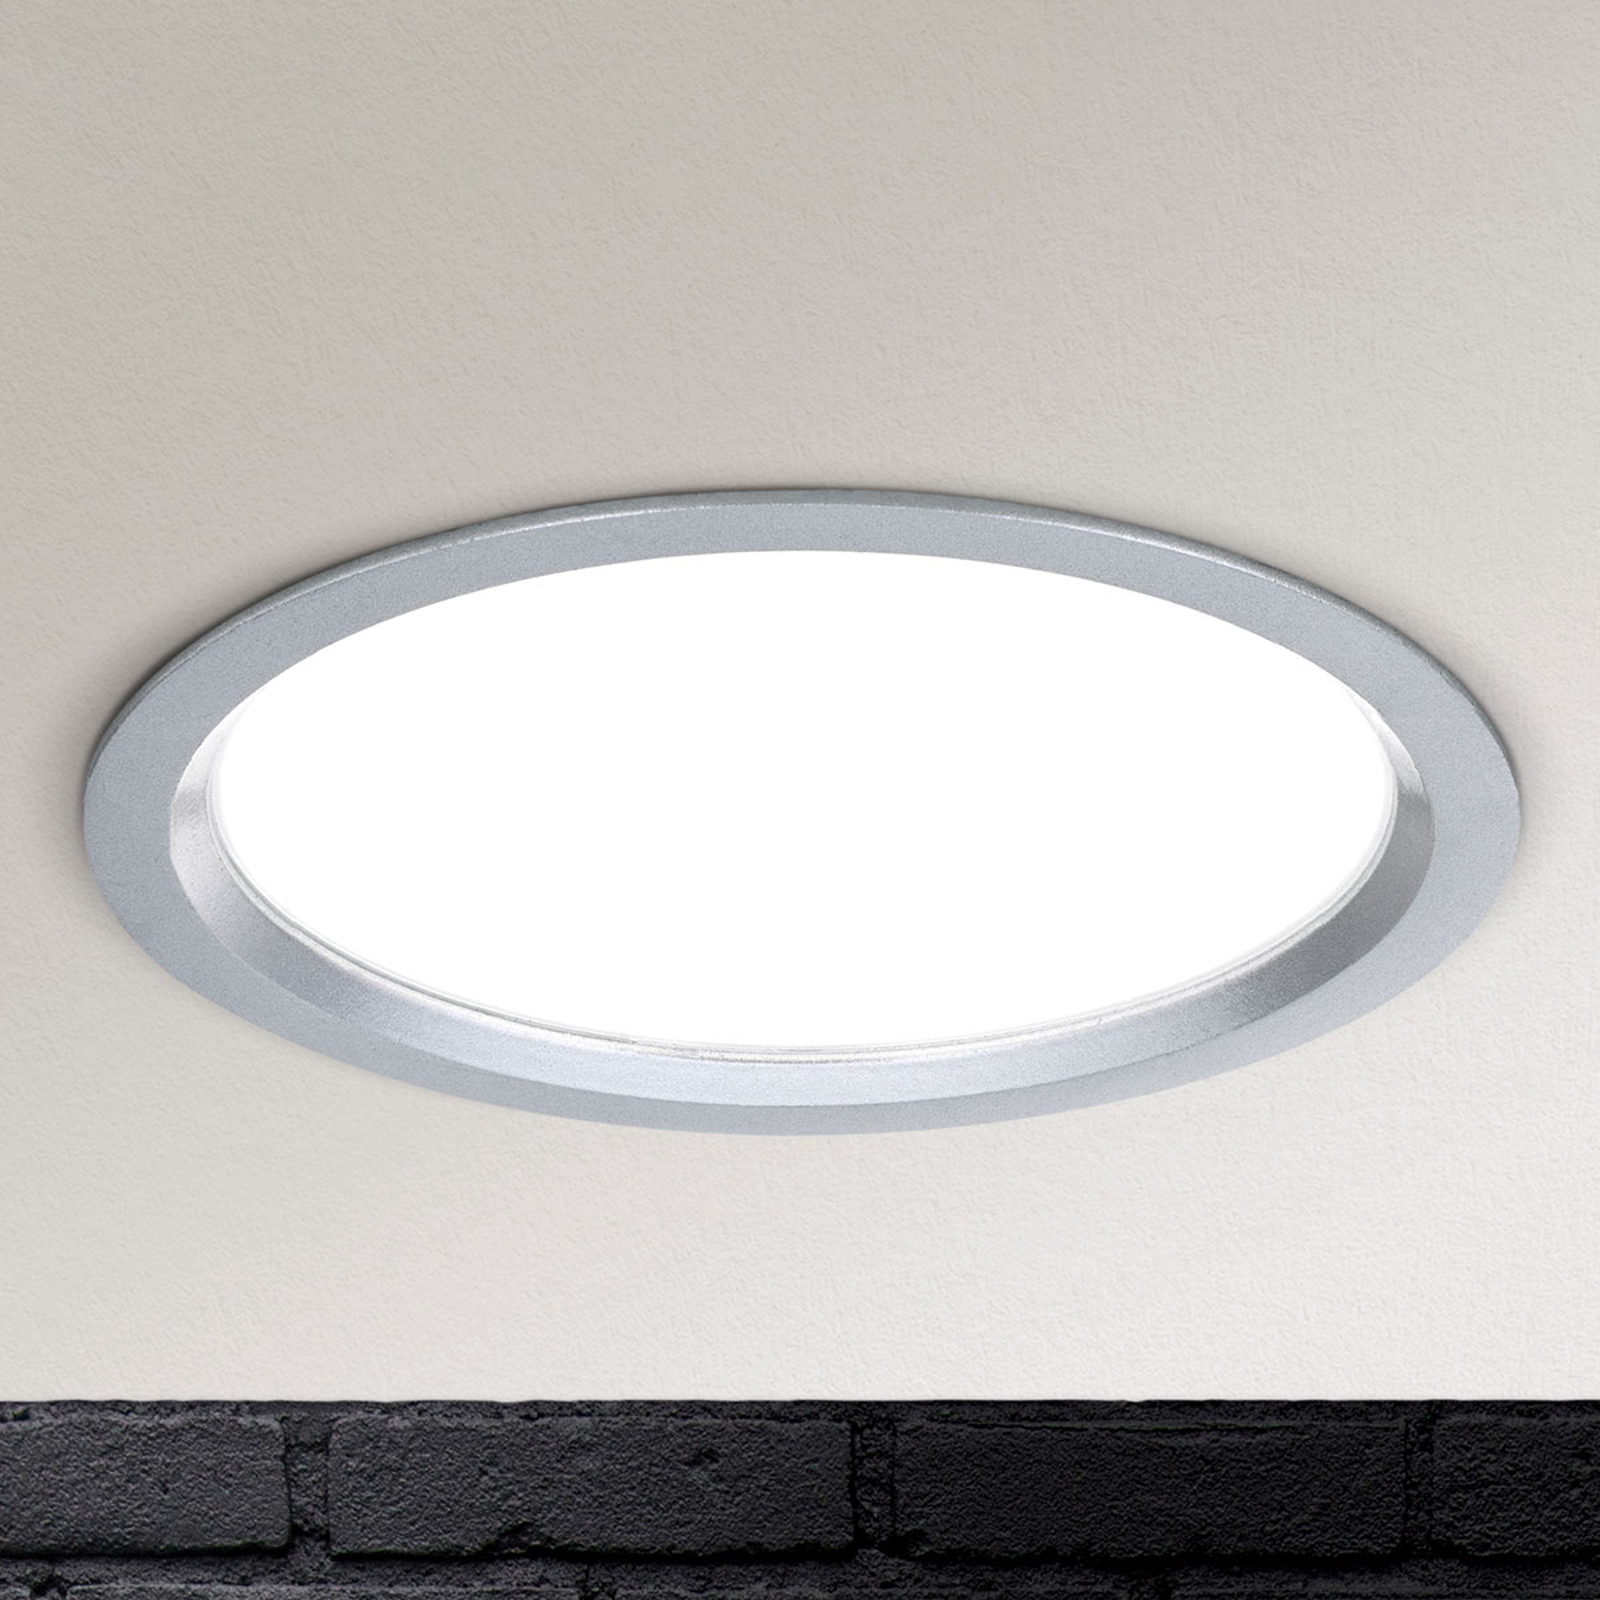 LED-Einbauleuchte Spock dimmbar Ø 17 cm silber